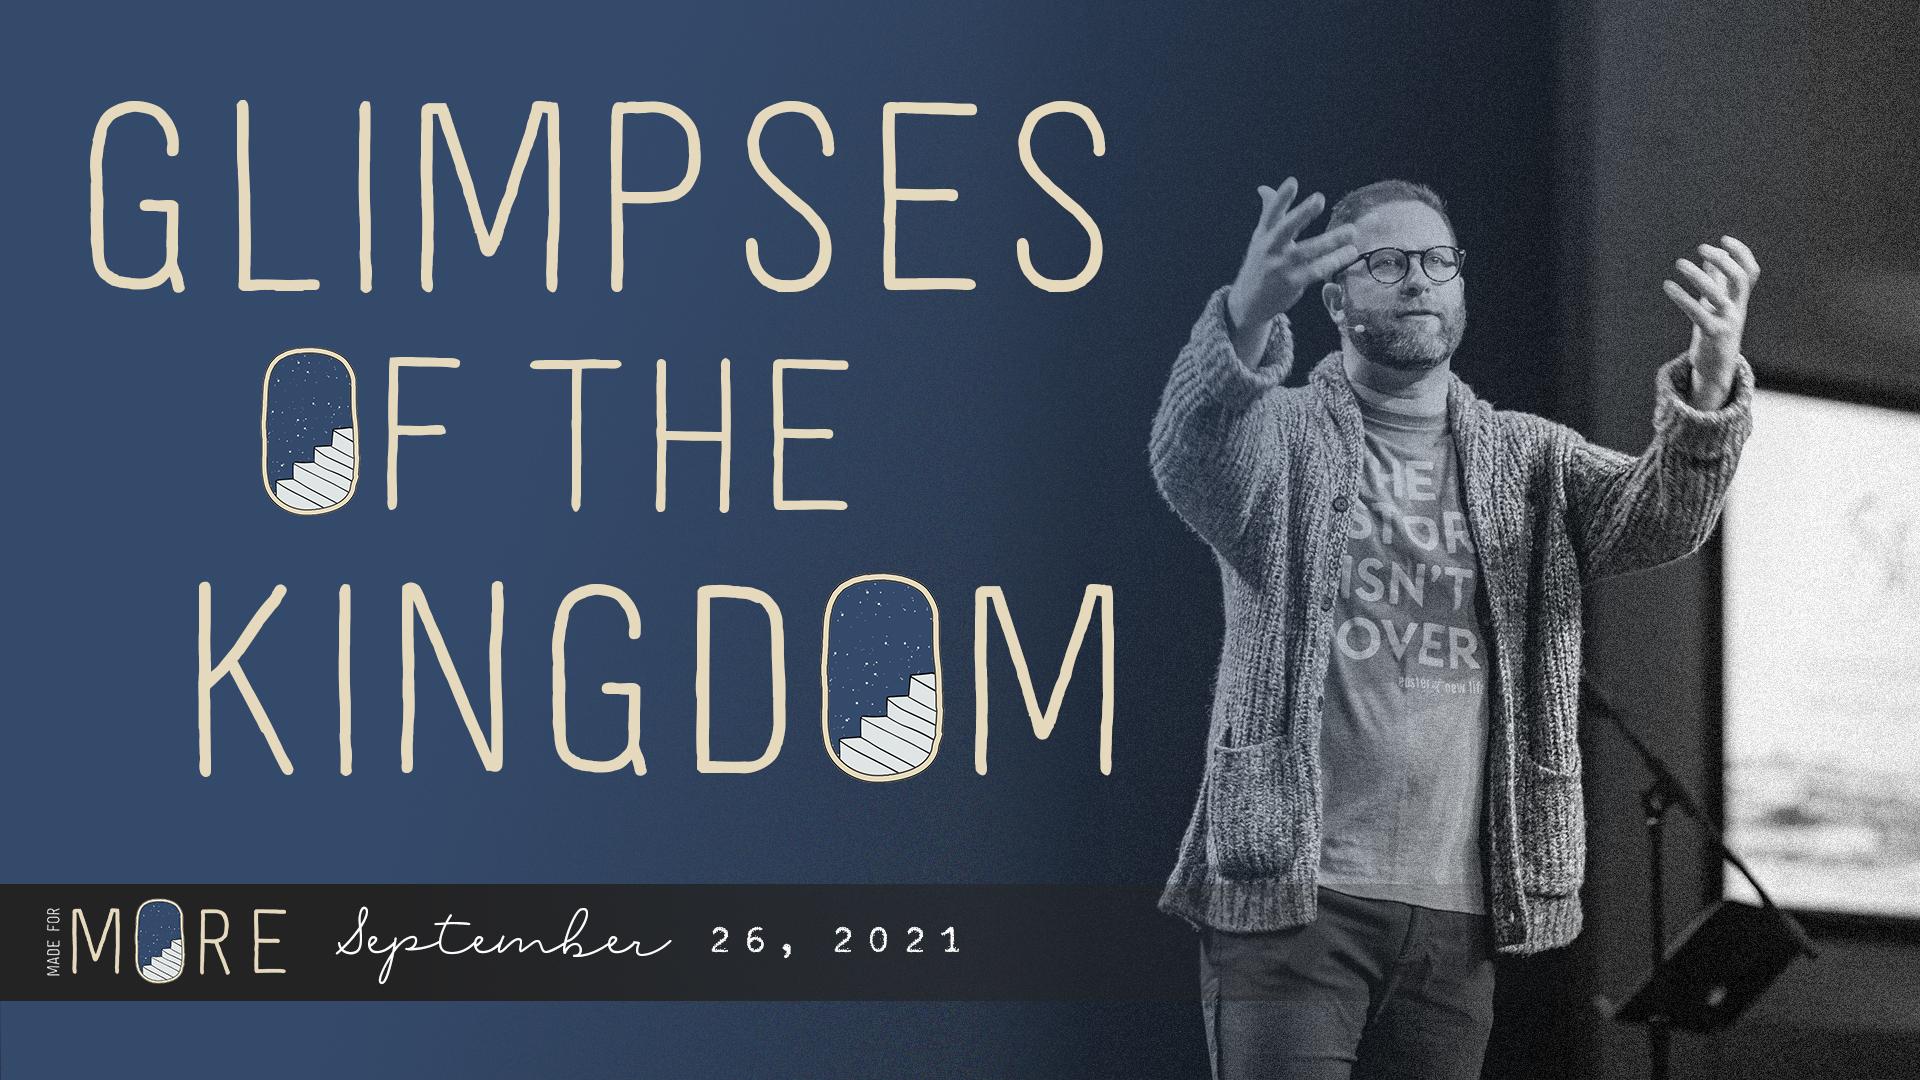 Glimpses of the Kingdom Image